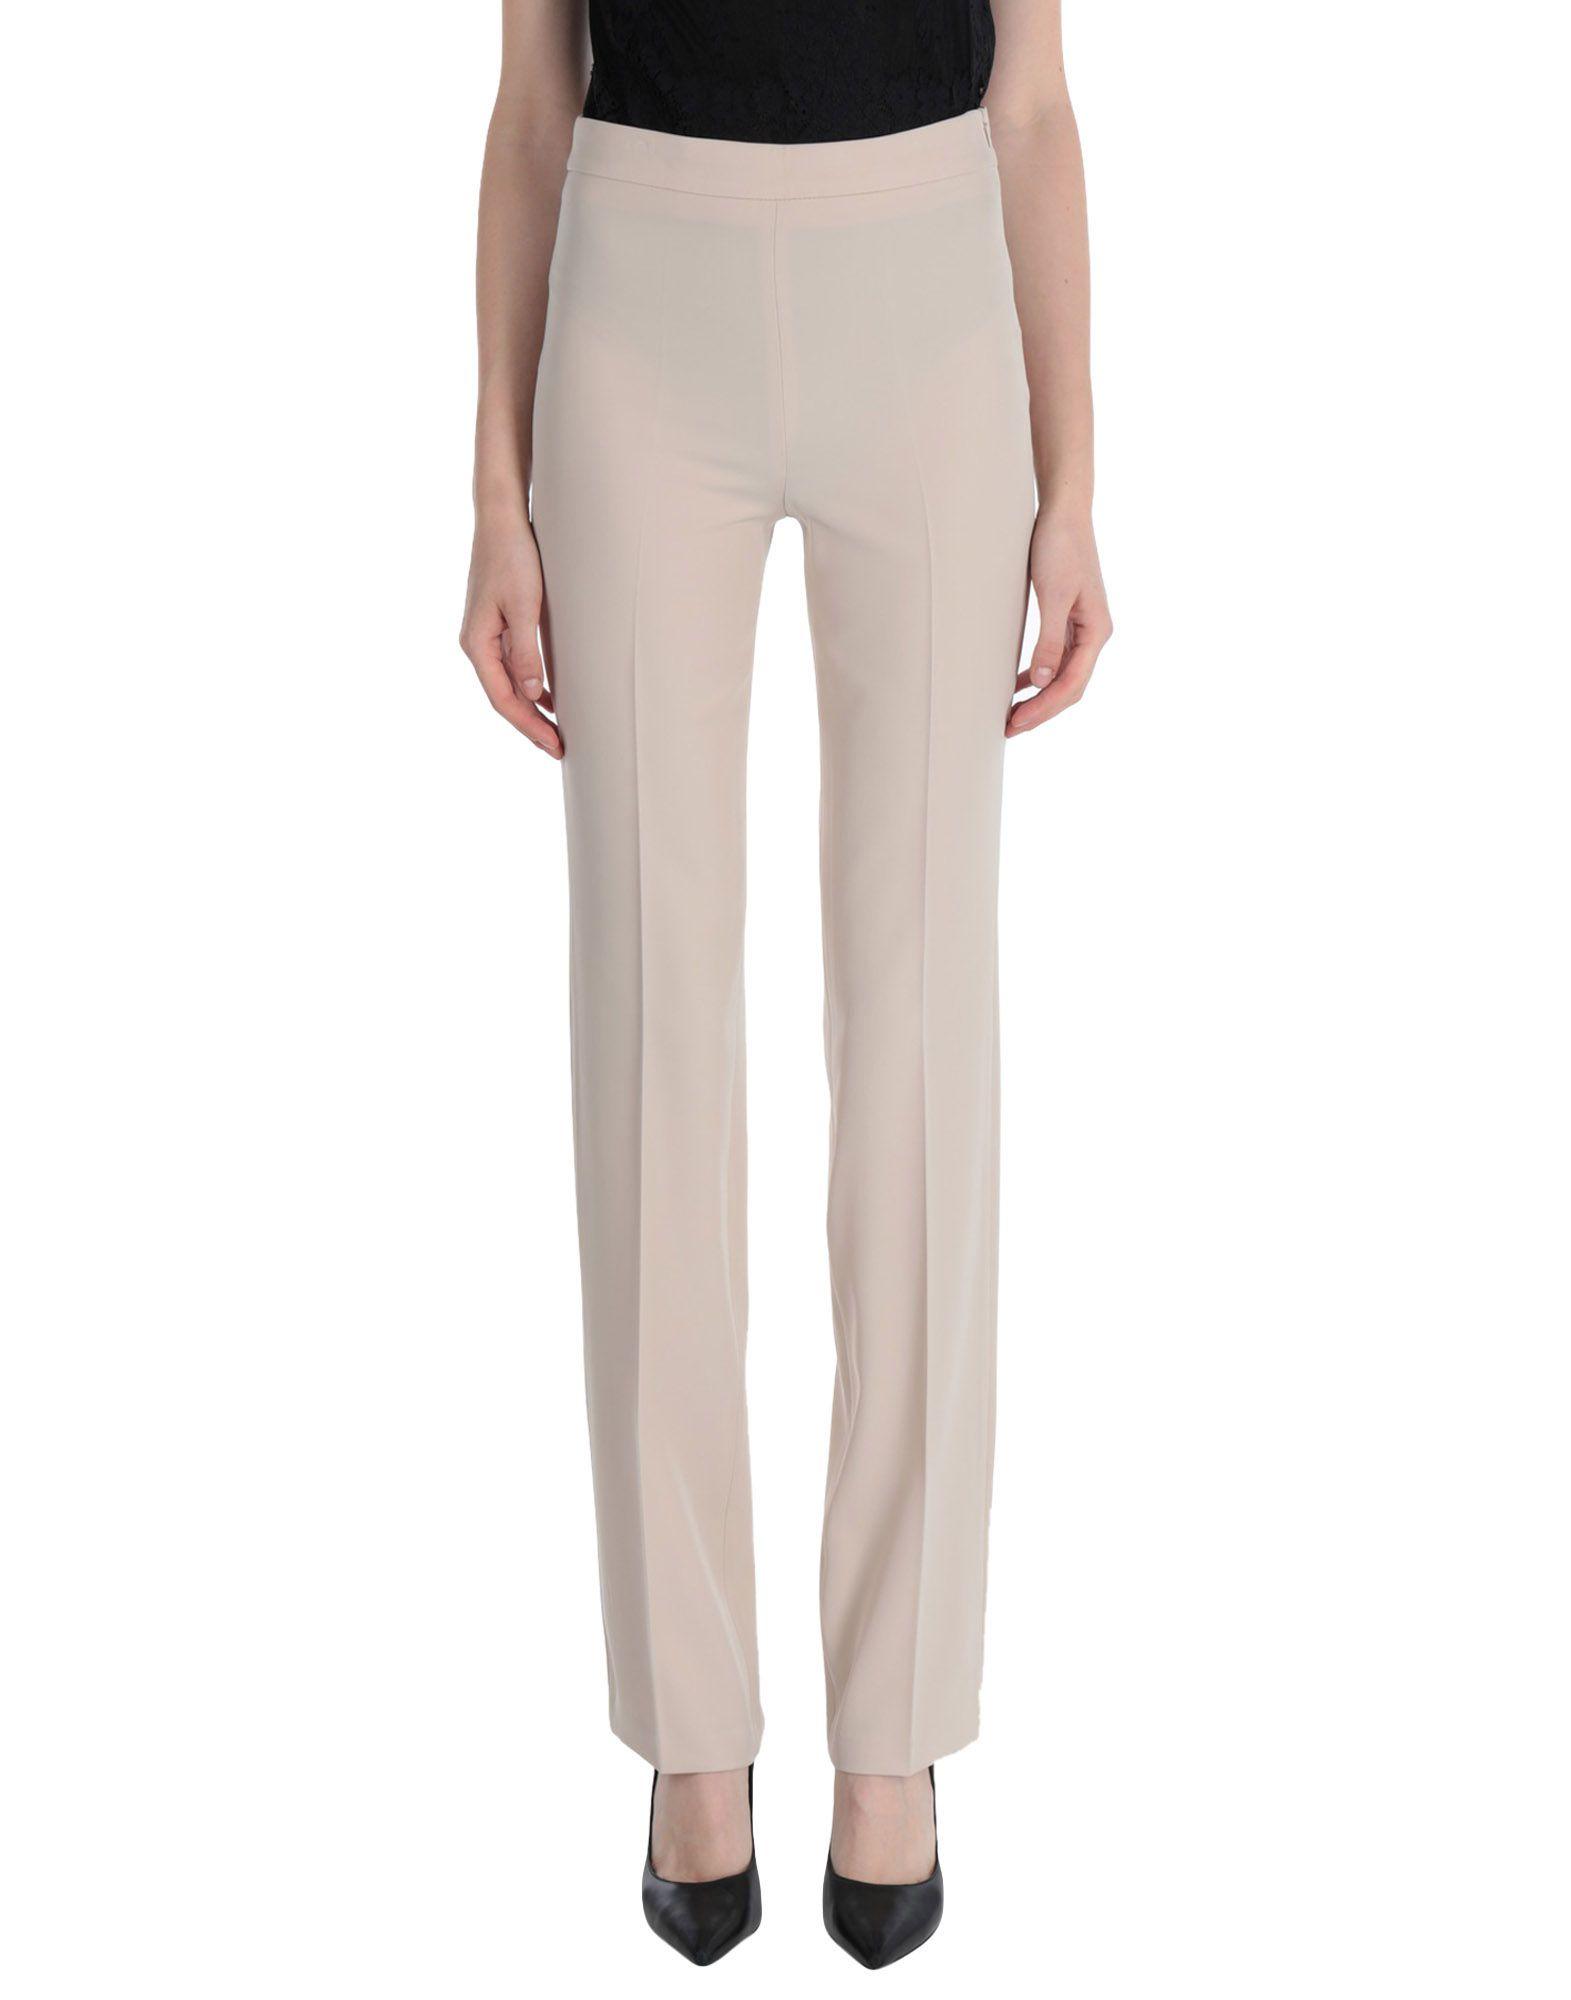 Pantalone La Kore donna donna donna - 13237177KN 32d